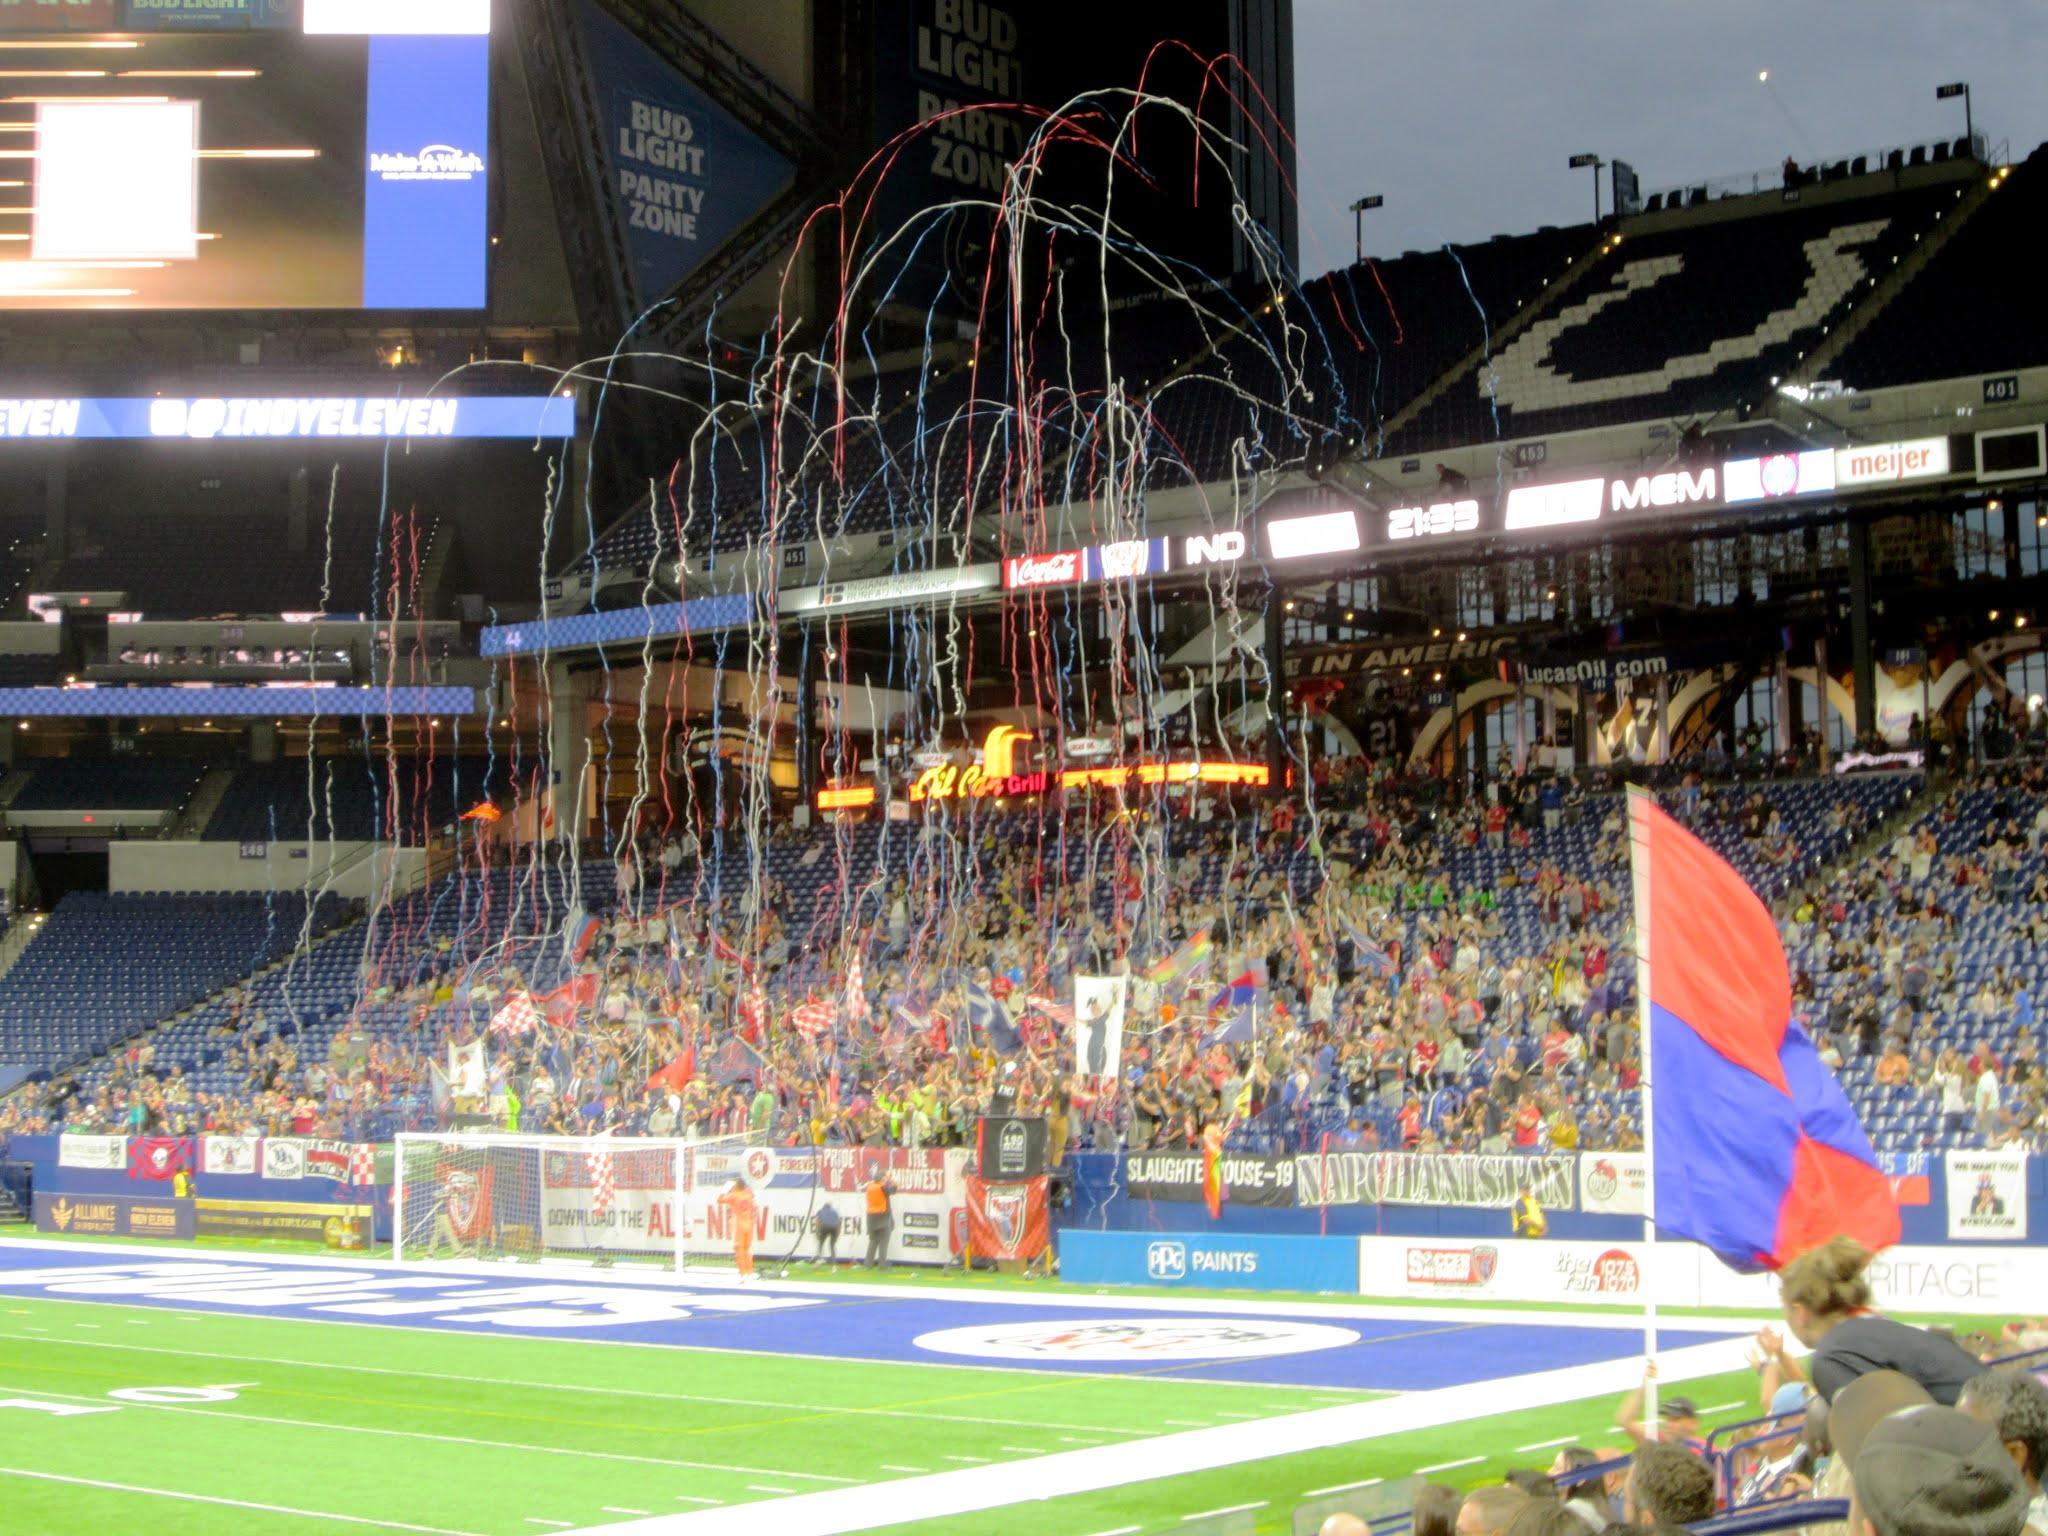 Brickyard Battalion celebrates a goal at Lucas Oil Stadium